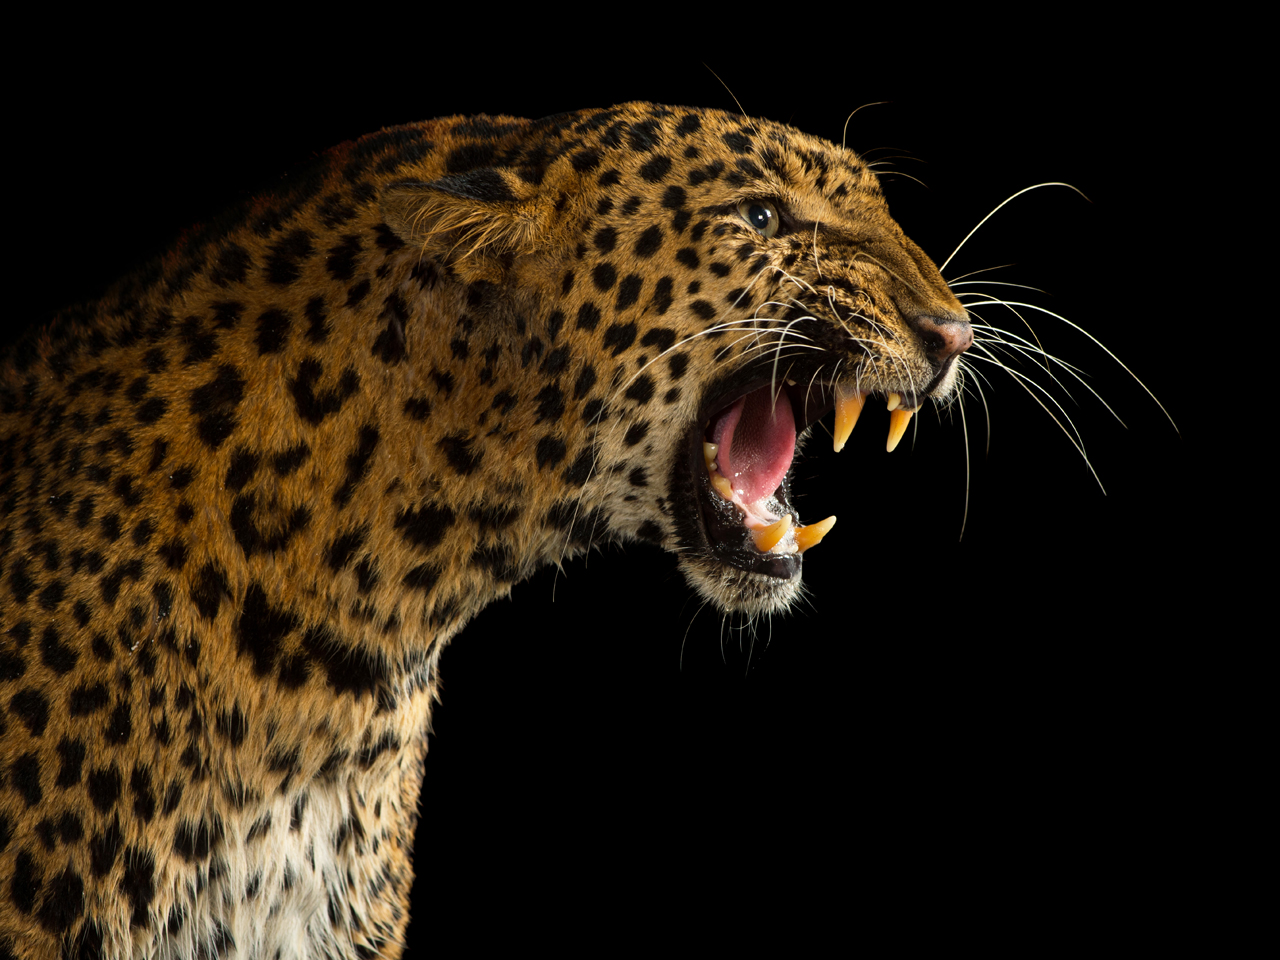 India leopards kill children in attacks on rural villages